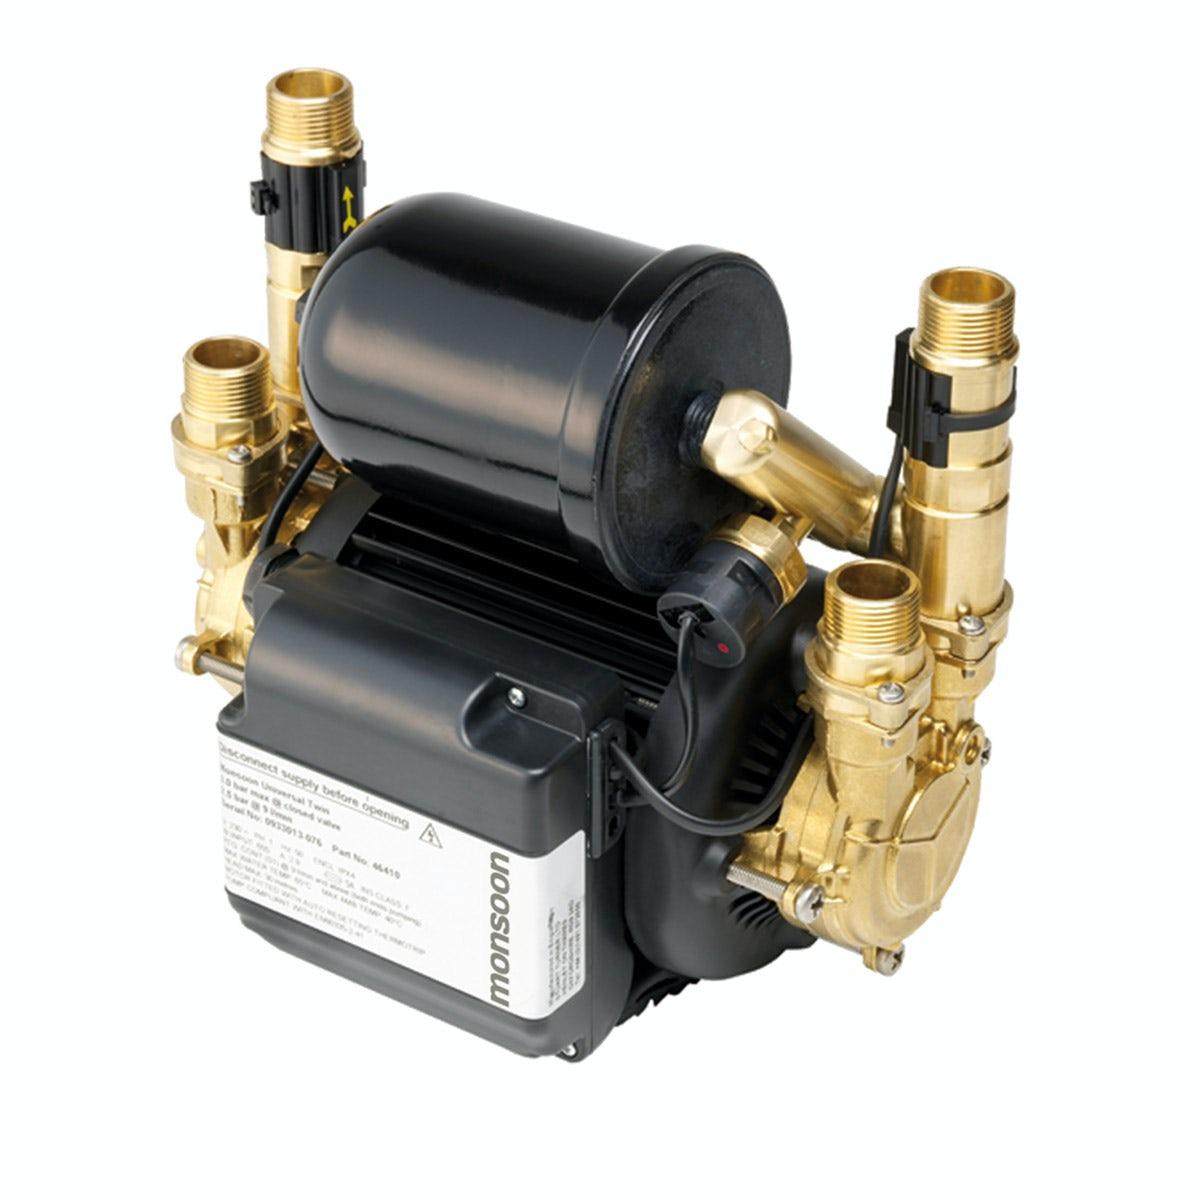 Stuart Turner Monsoon standard 3.0 bar twin shower pump